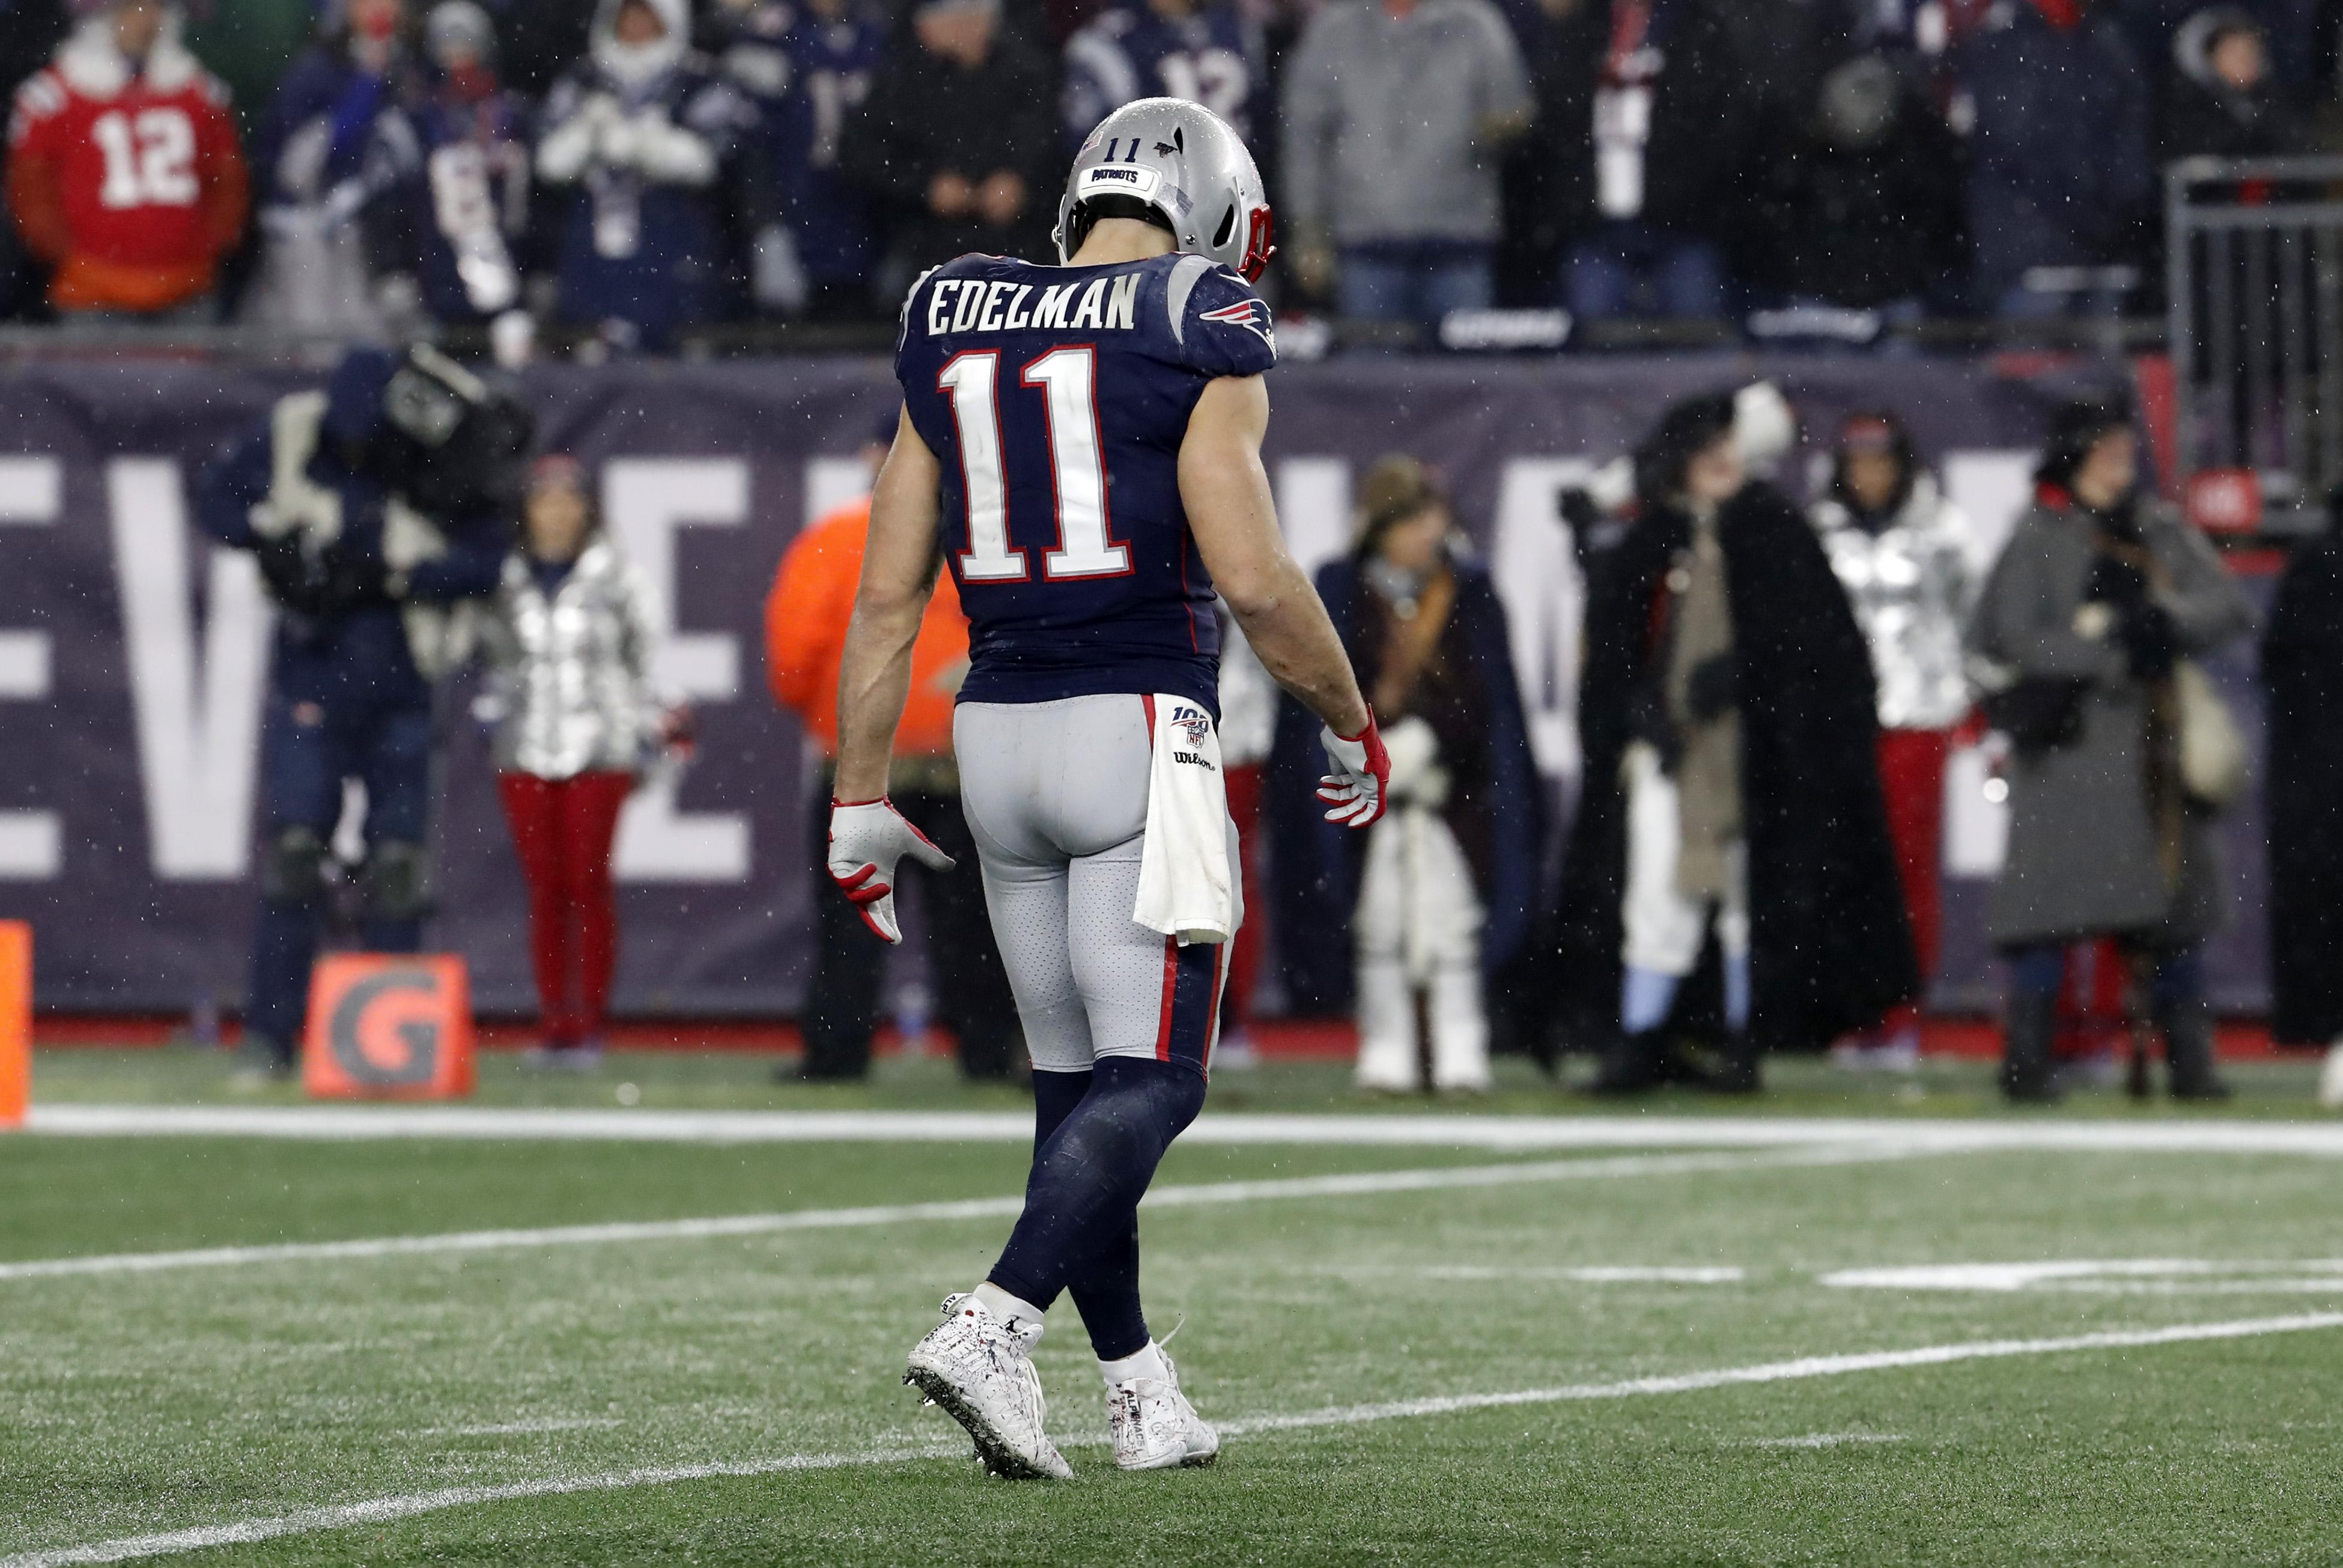 NFL: JAN 04 AFC Wild Card - Titans at Patriots